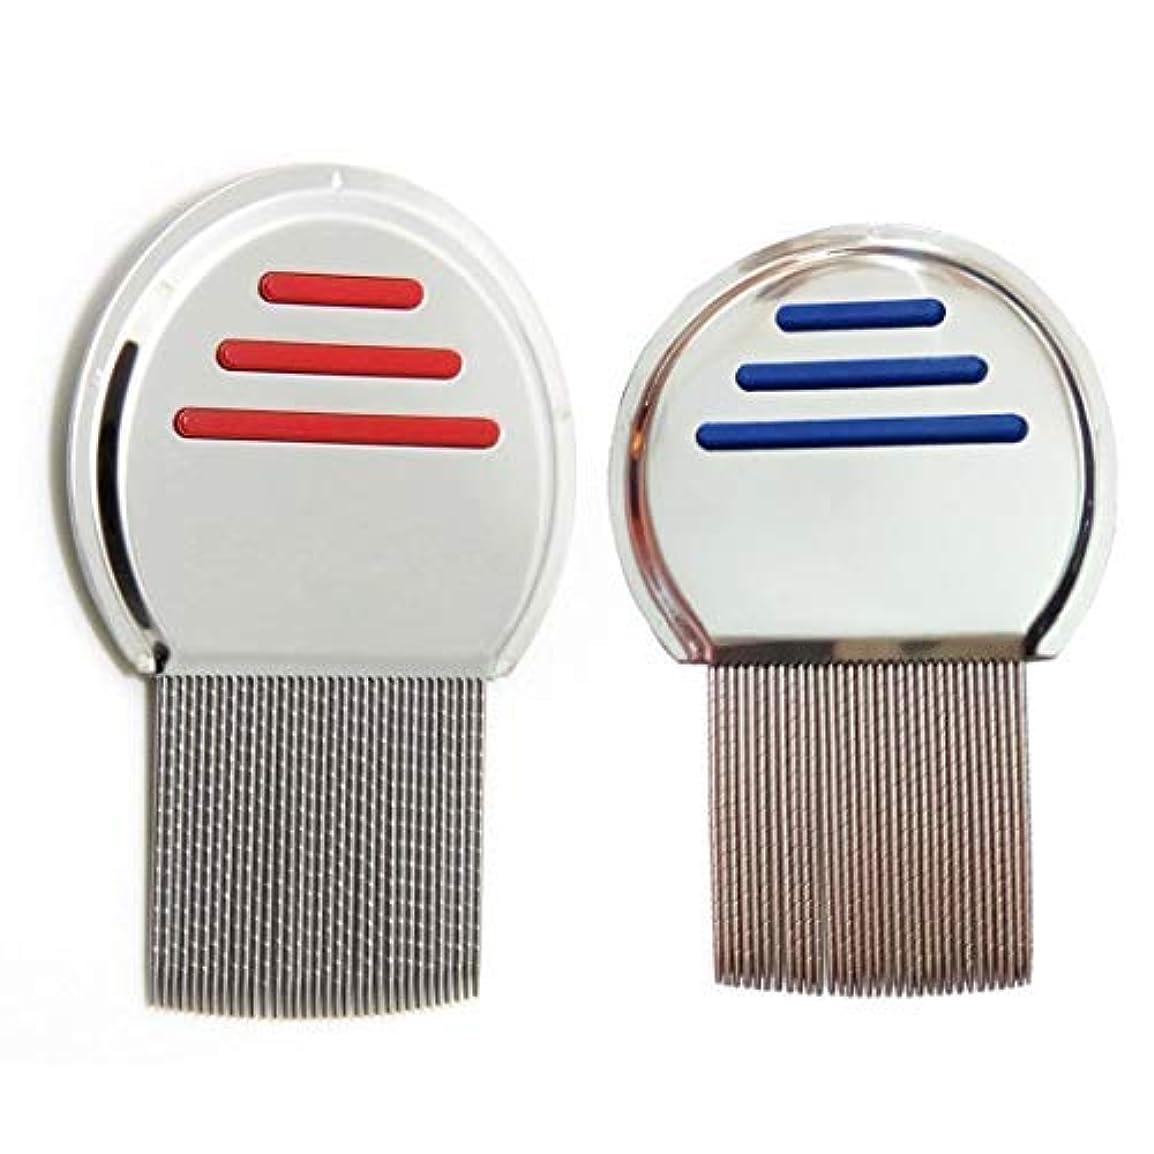 右自発左2 Pcs Stainless Steel Lice Dandruff Comb [並行輸入品]